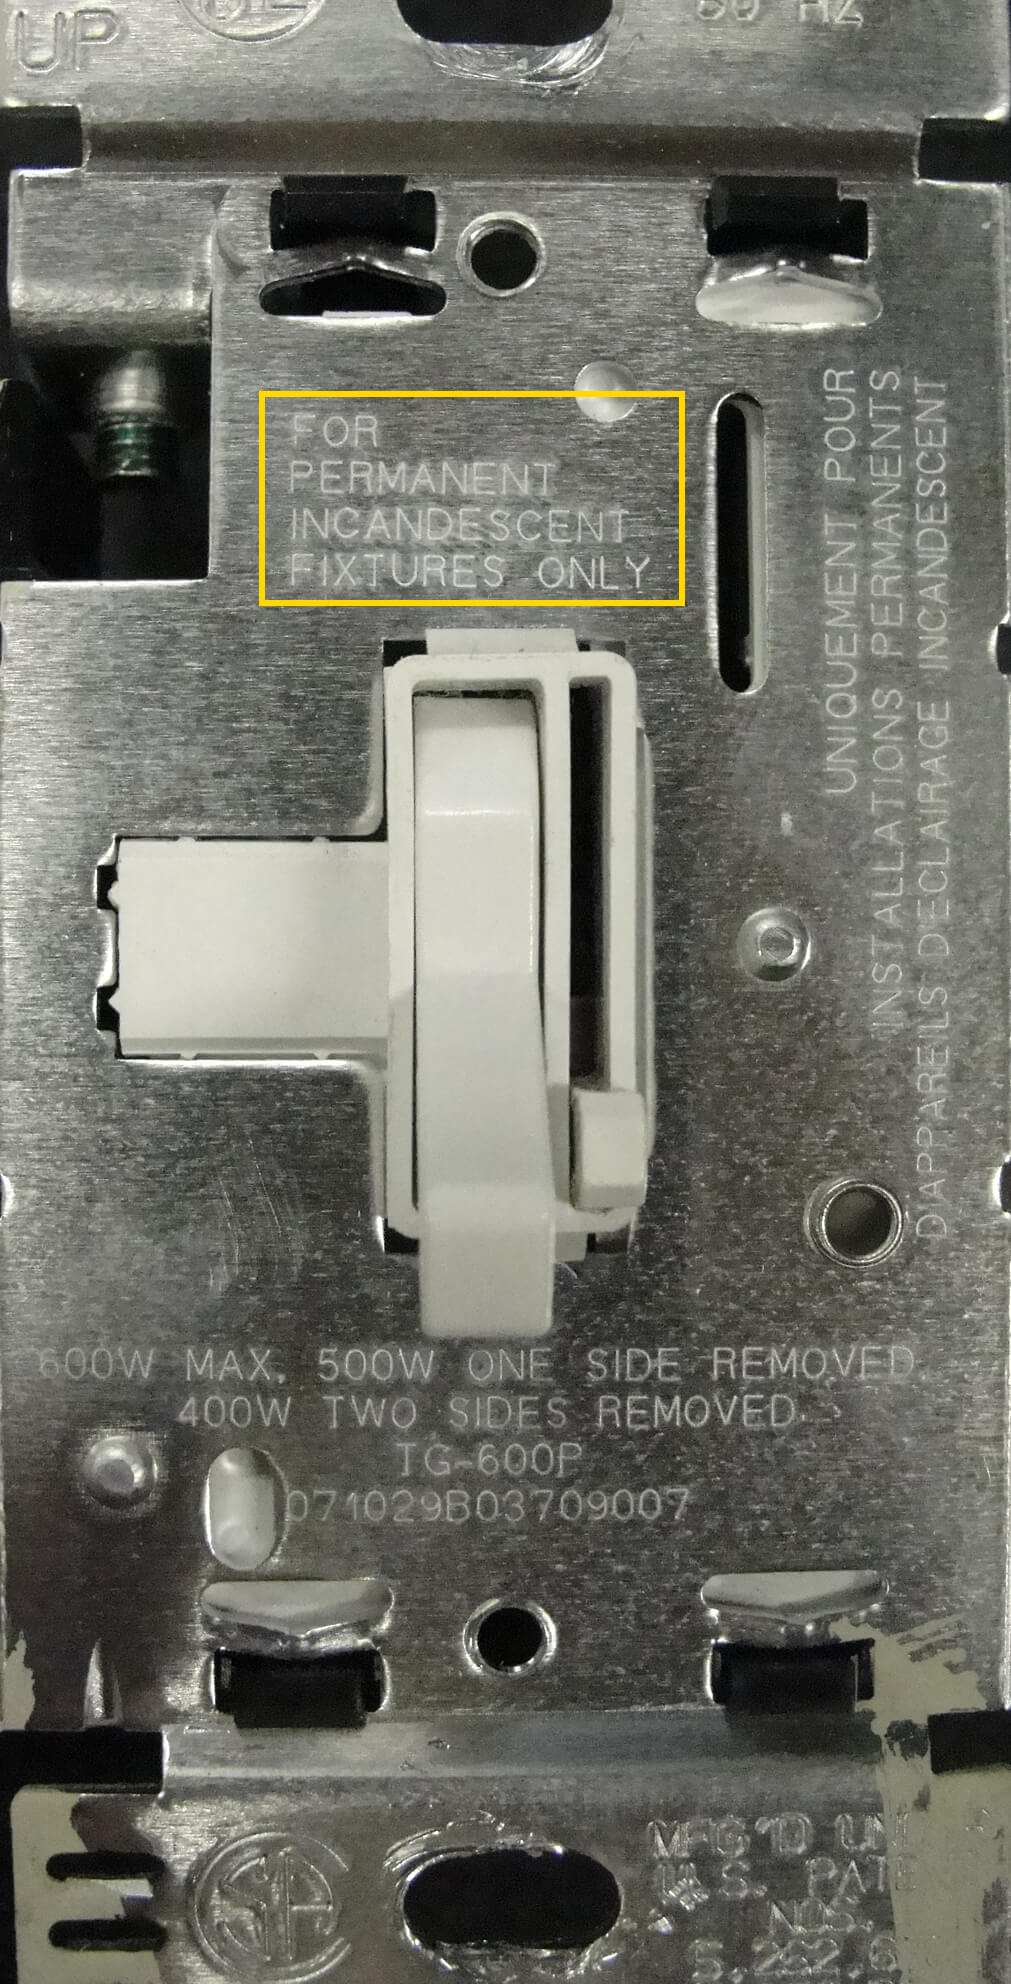 bathroom exhaust fan with light wiring diagram wb statesman dash dimmer switch on ceiling fire hazard